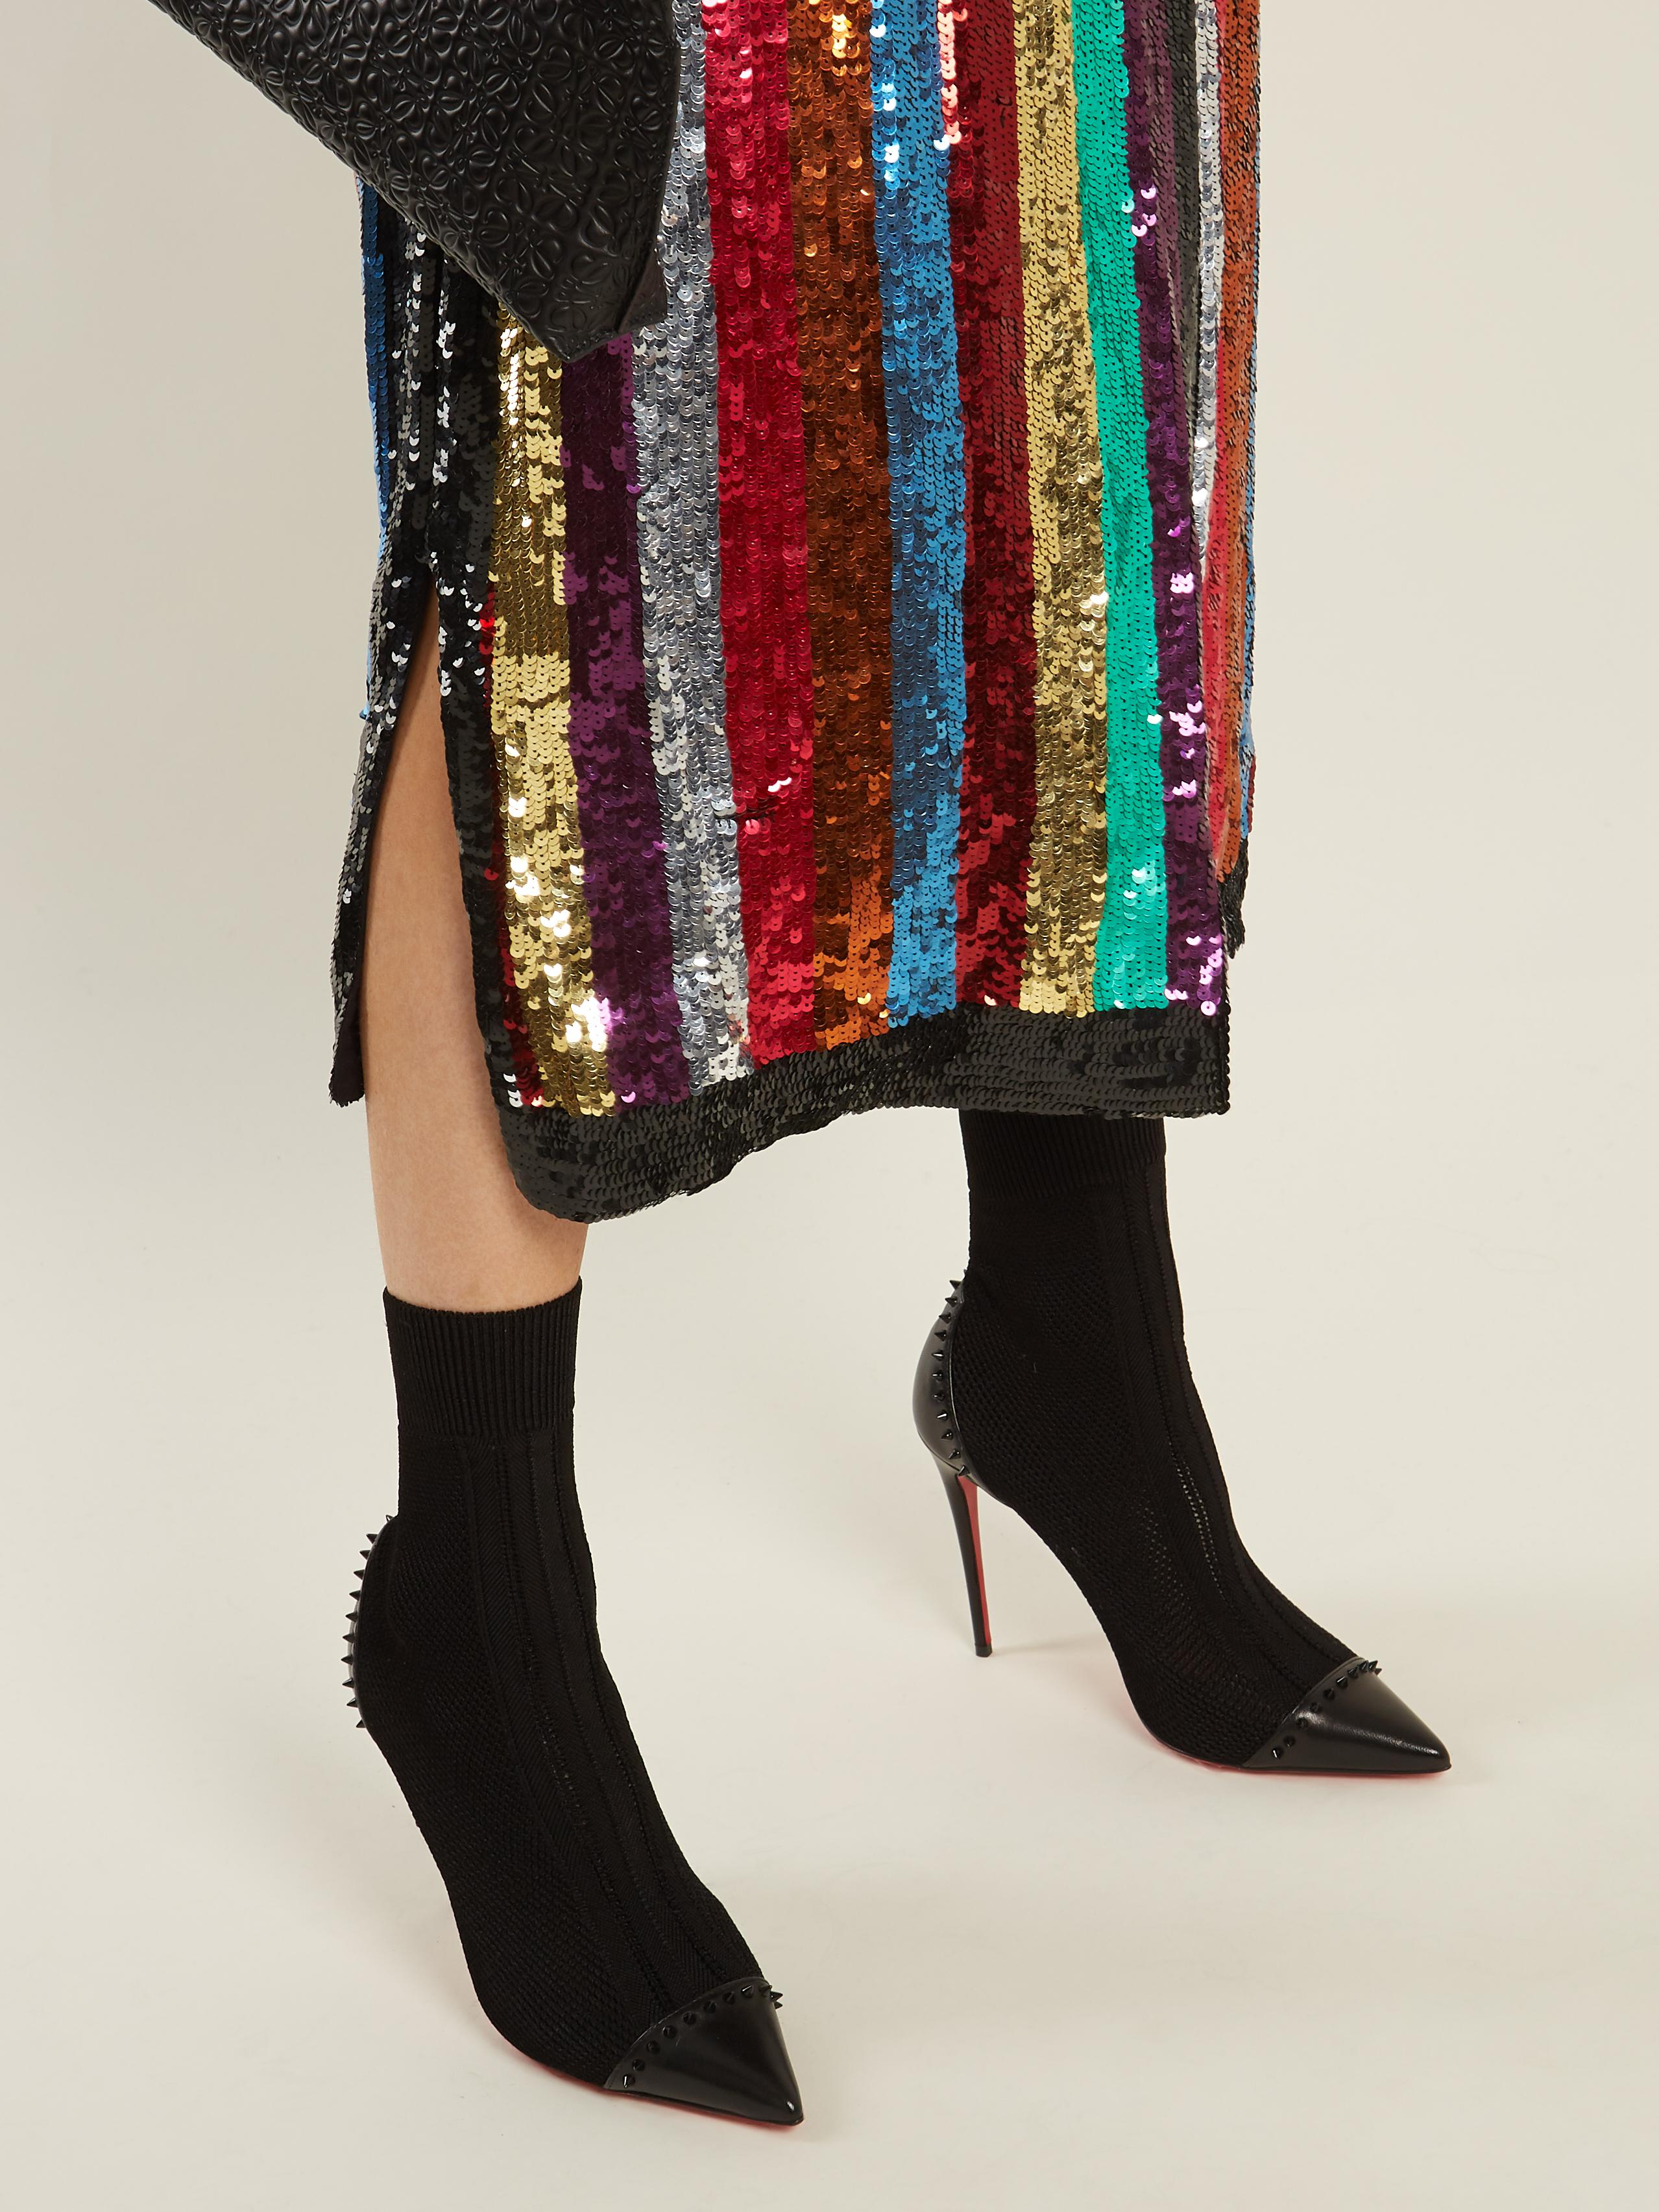 Lyst - Christian Louboutin Dovi Dova Stud-embellished Sock Boots in ... 890da5374591